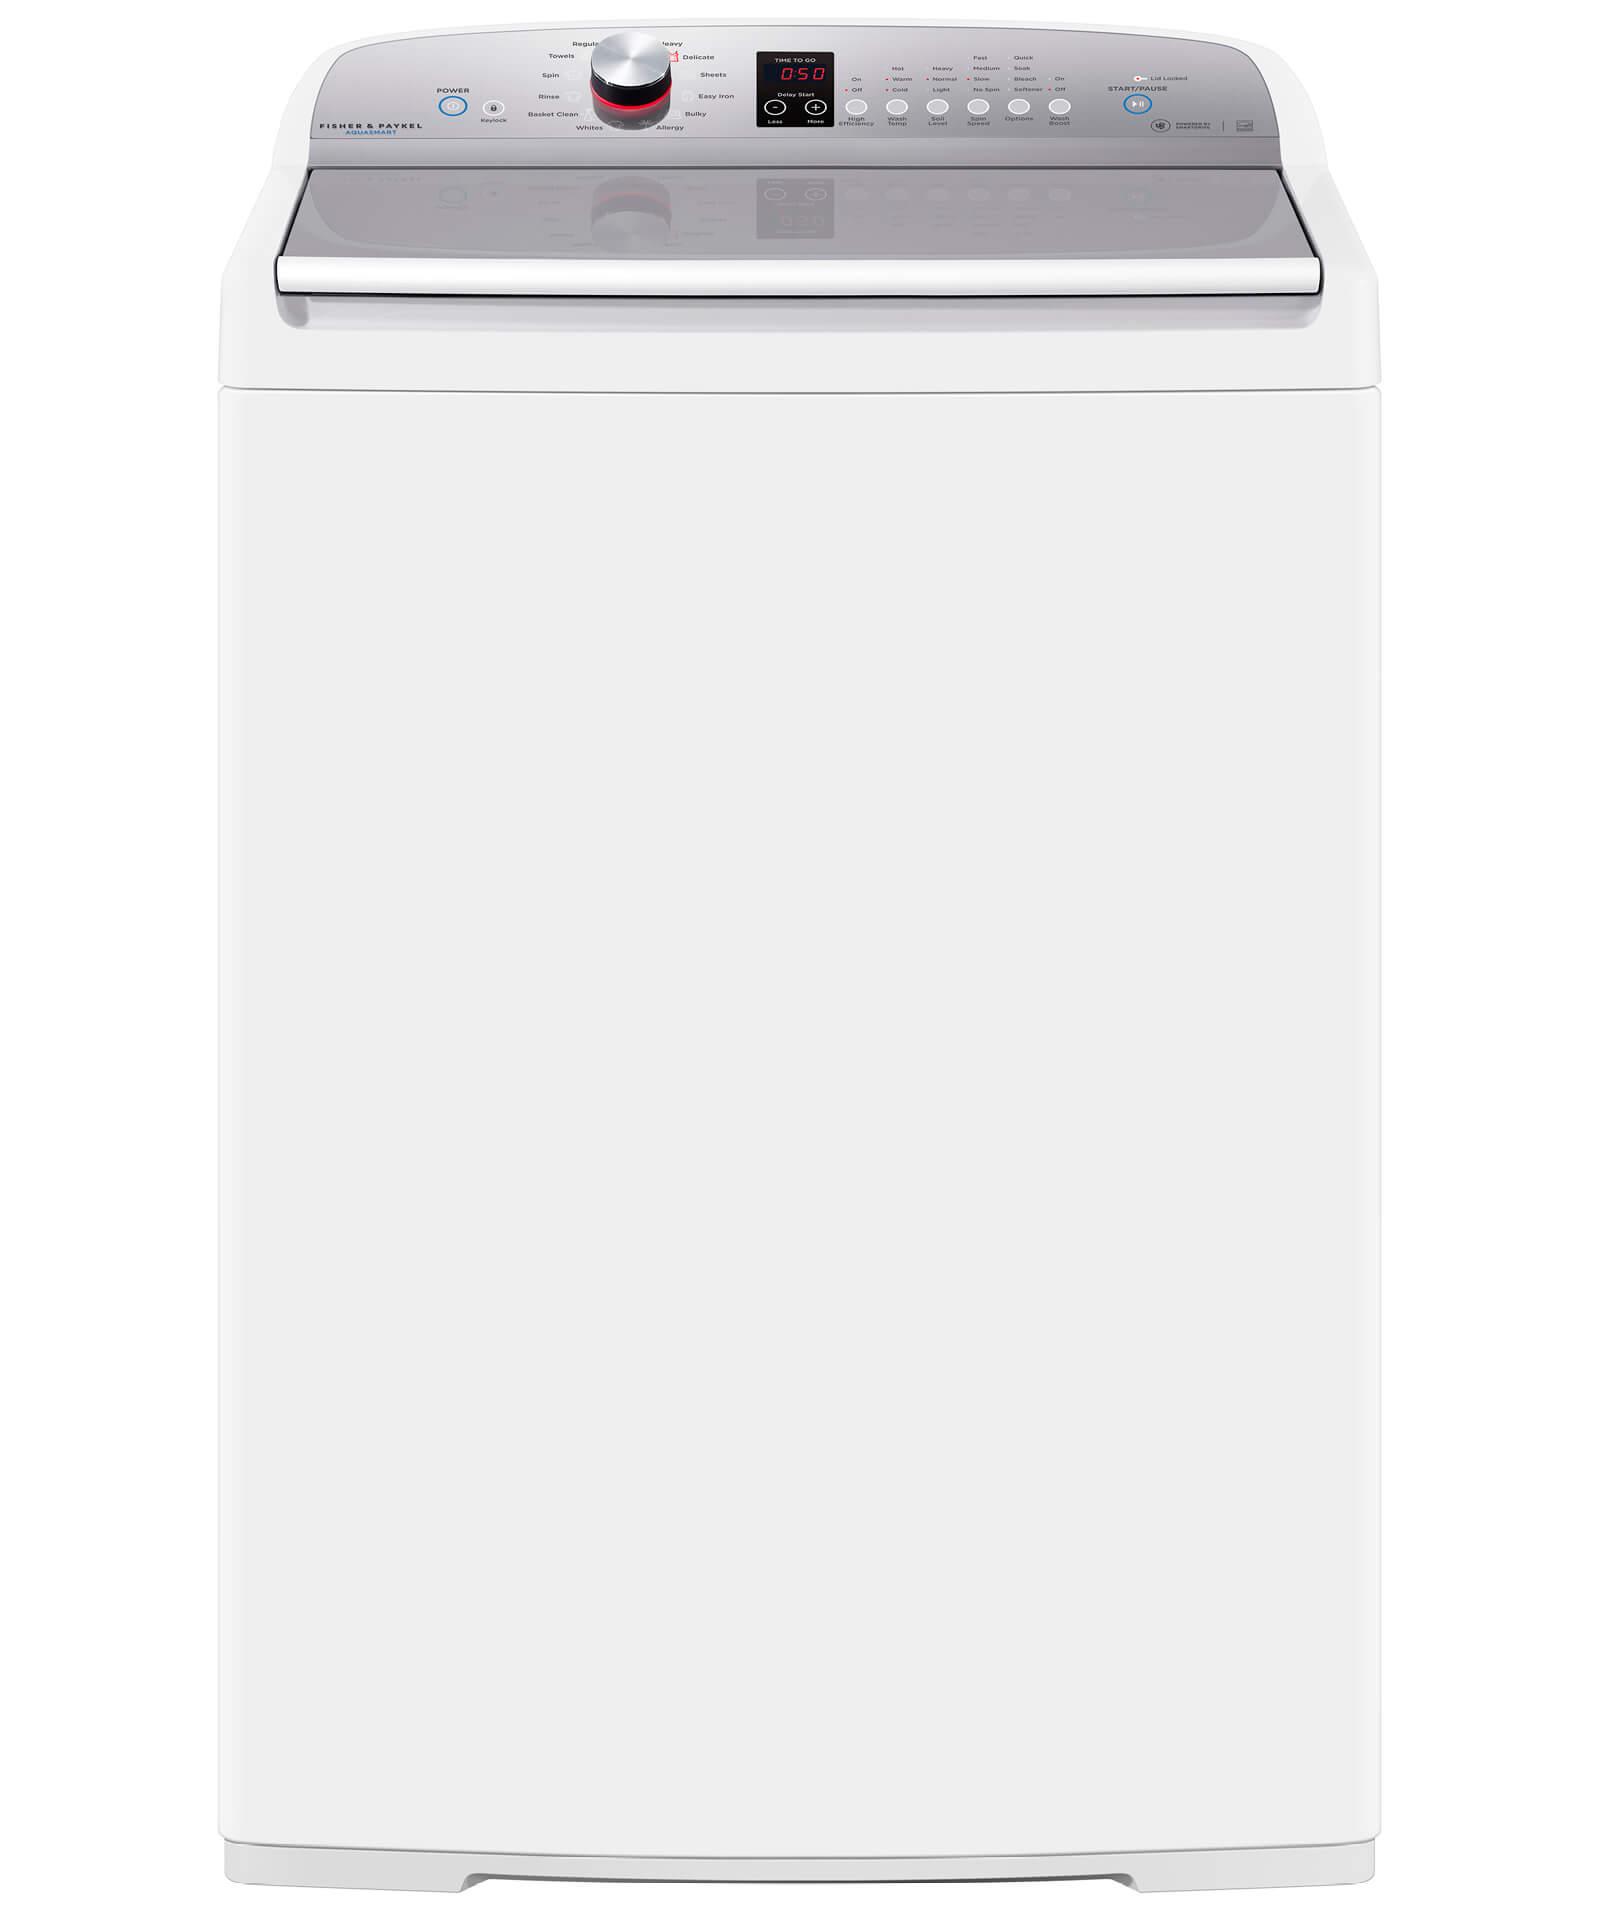 Top Loader Washing Machine, 4 cu ft AquaSmart™